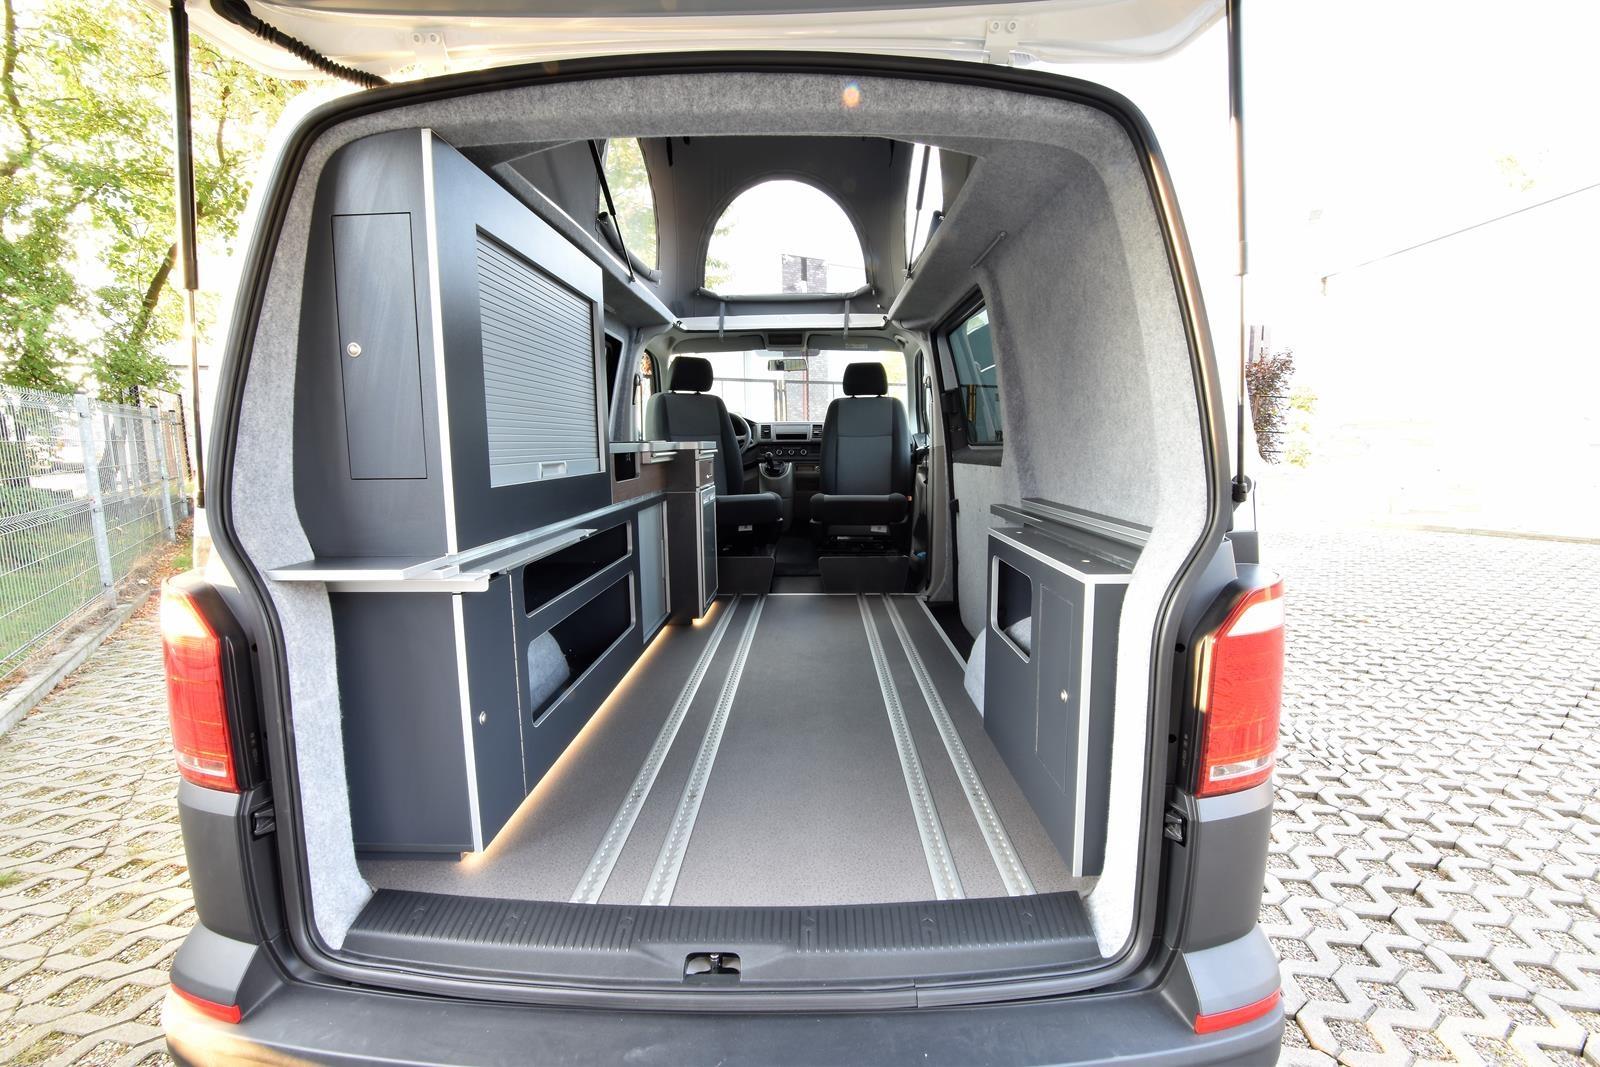 VW-krt inkijk 21